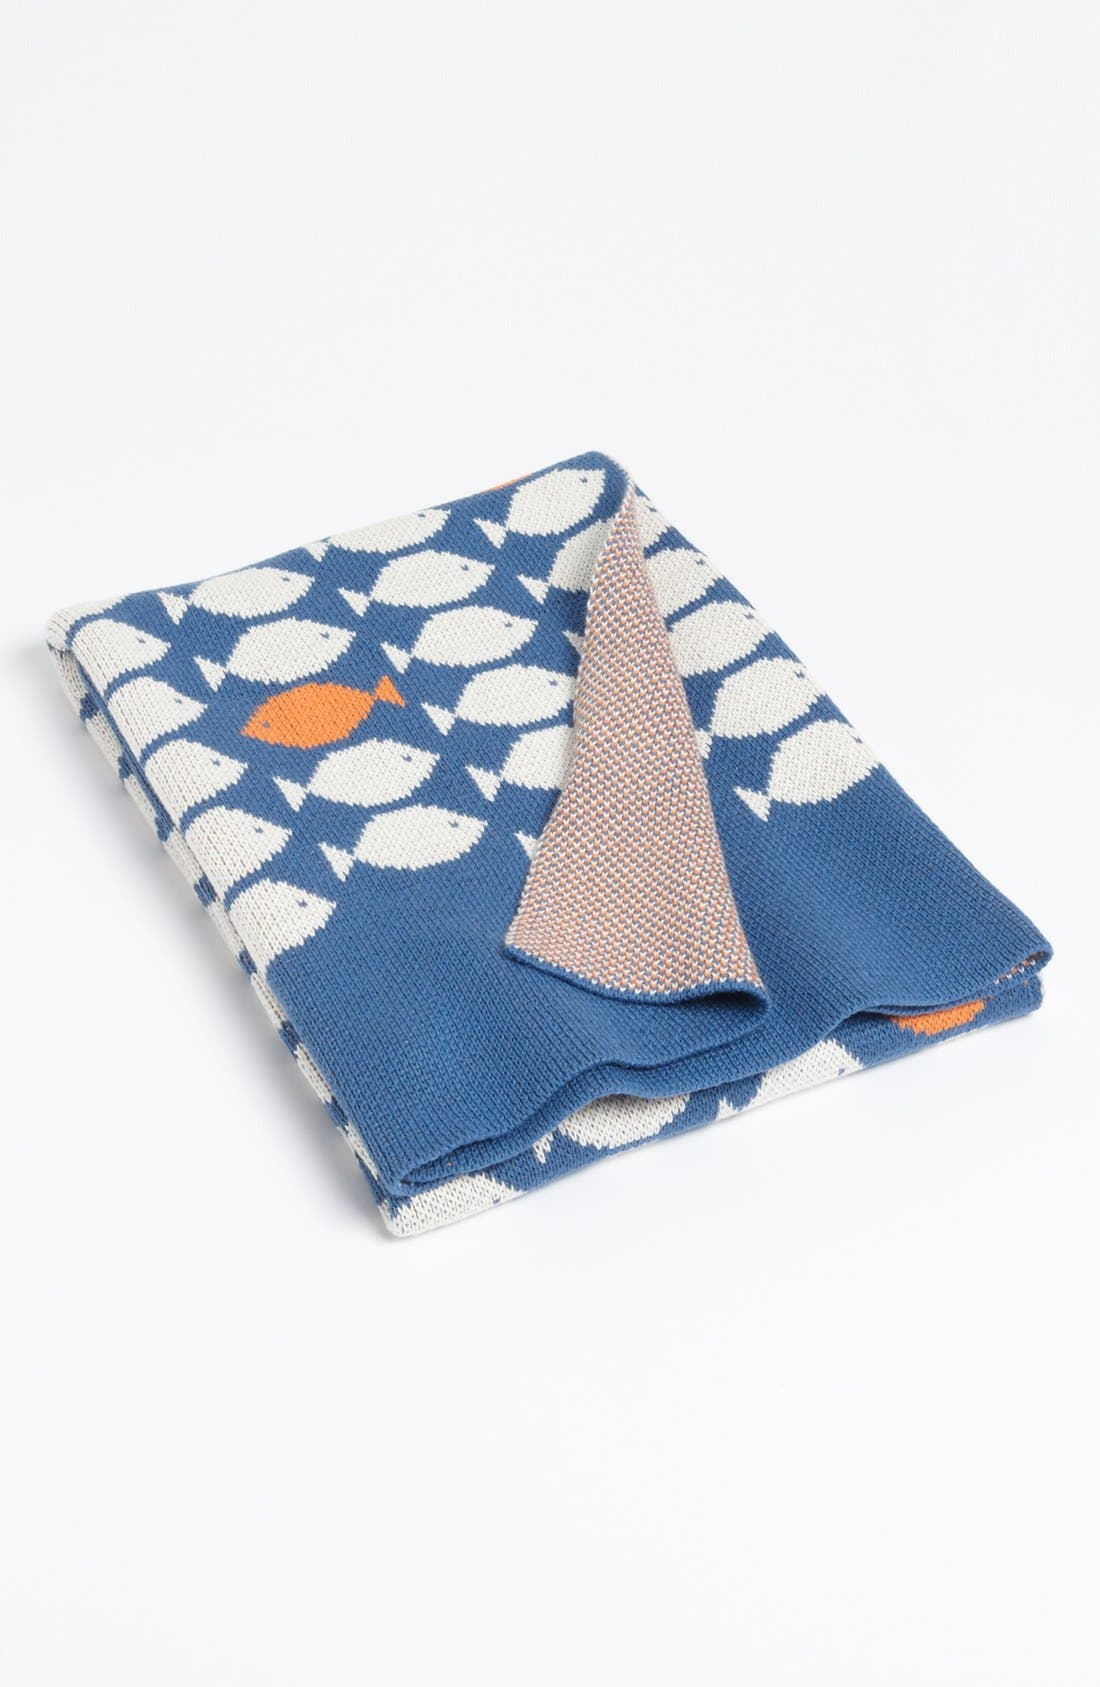 Main Image - Stem Baby 'Fashion' Organic Cotton Blanket